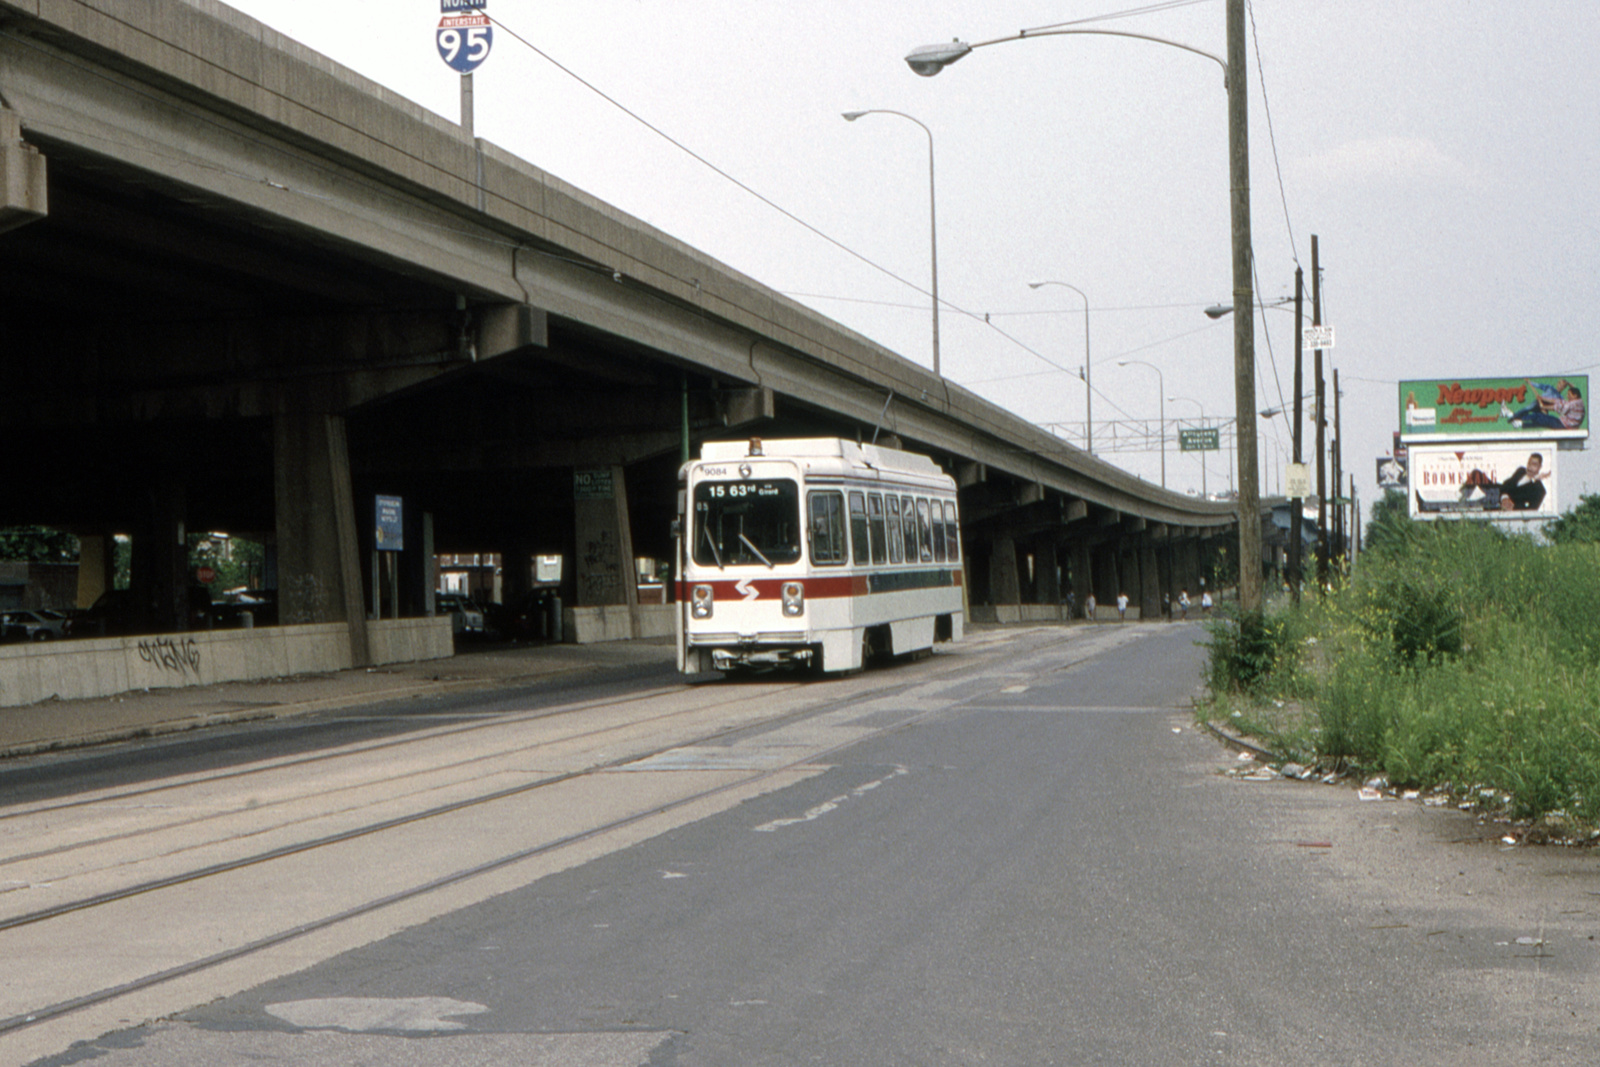 (664k, 1600x1067)<br><b>Country:</b> United States<br><b>City:</b> Philadelphia, PA<br><b>System:</b> SEPTA (or Predecessor)<br><b>Line:</b> Rt. 15-Girard<br><b>Location:</b> Richmond/Cumberland<br><b>Car:</b> SEPTA K Single-ended (Kawasaki, 1981) 9084 <br><b>Collection of:</b> David Pirmann<br><b>Date:</b> 6/20/1992<br><b>Viewed (this week/total):</b> 1 / 85